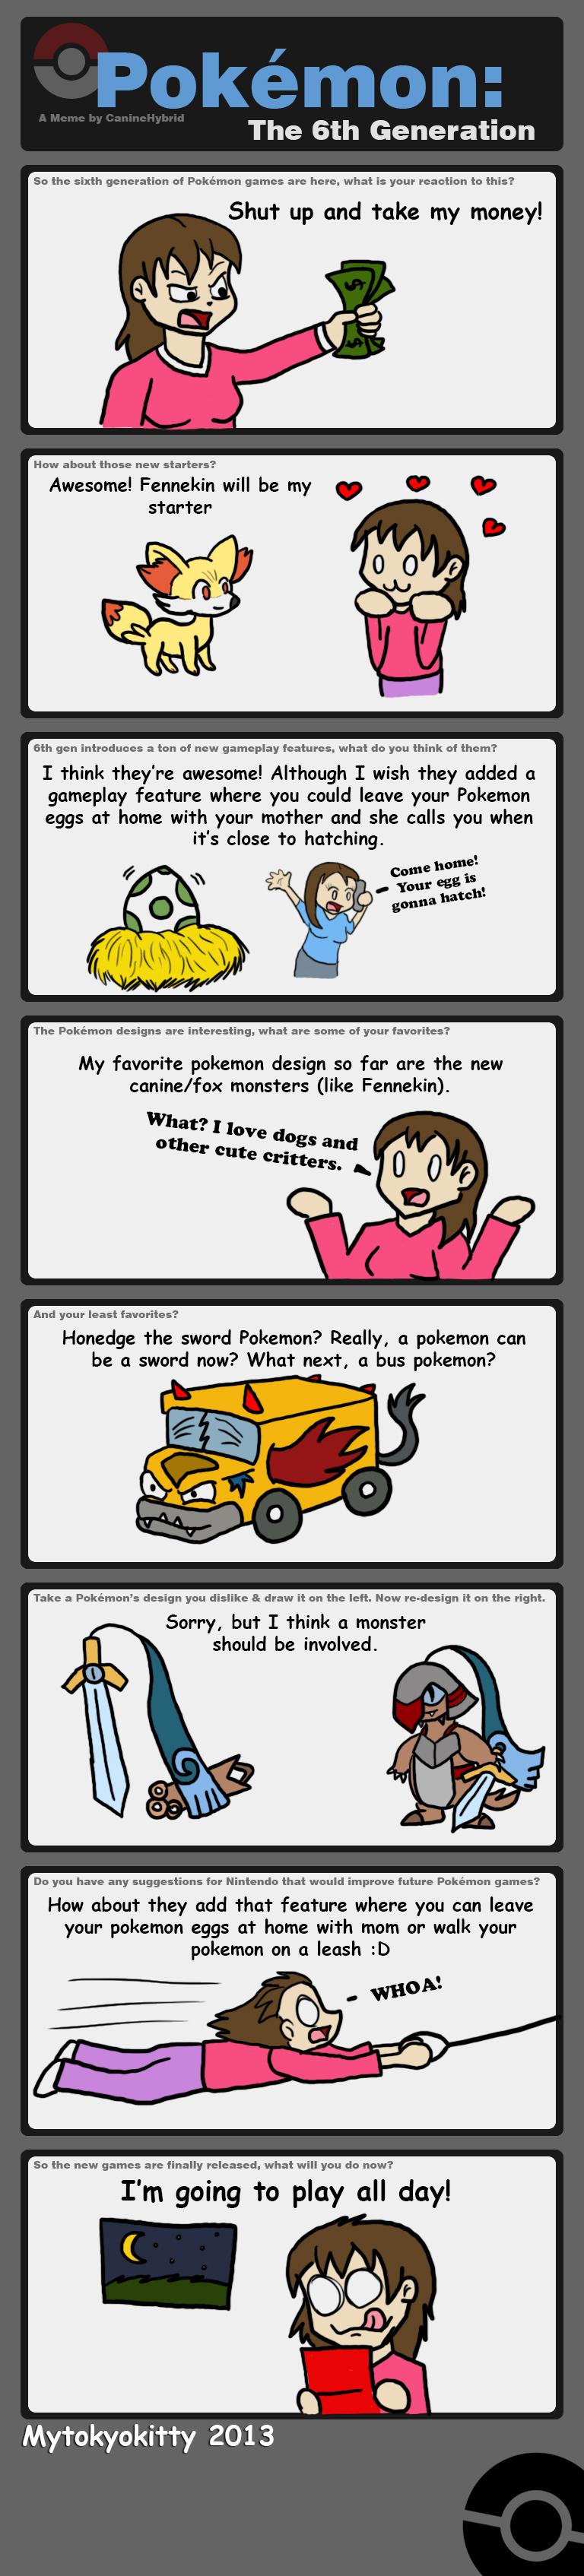 my_pokemon_x_and_y_meme_by_mytokyokitty d6q293t pokemon 6th gen meme favourites by caninehybrid on deviantart